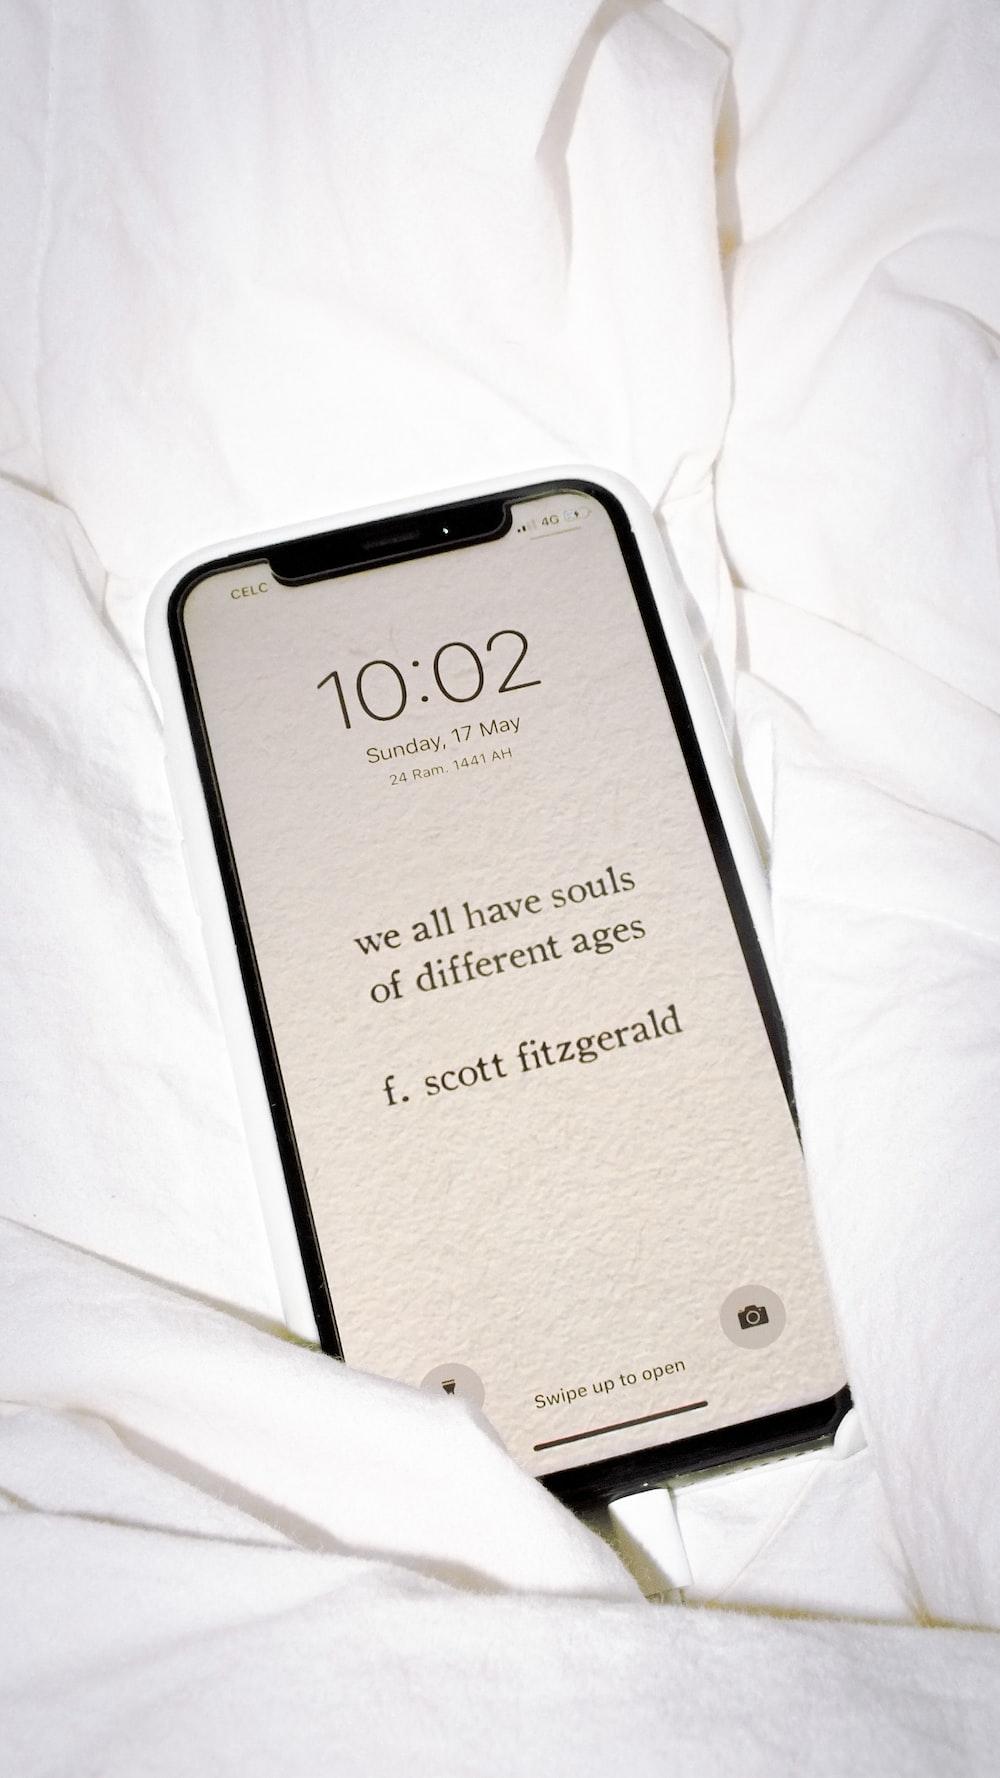 black samsung galaxy smartphone on white textile